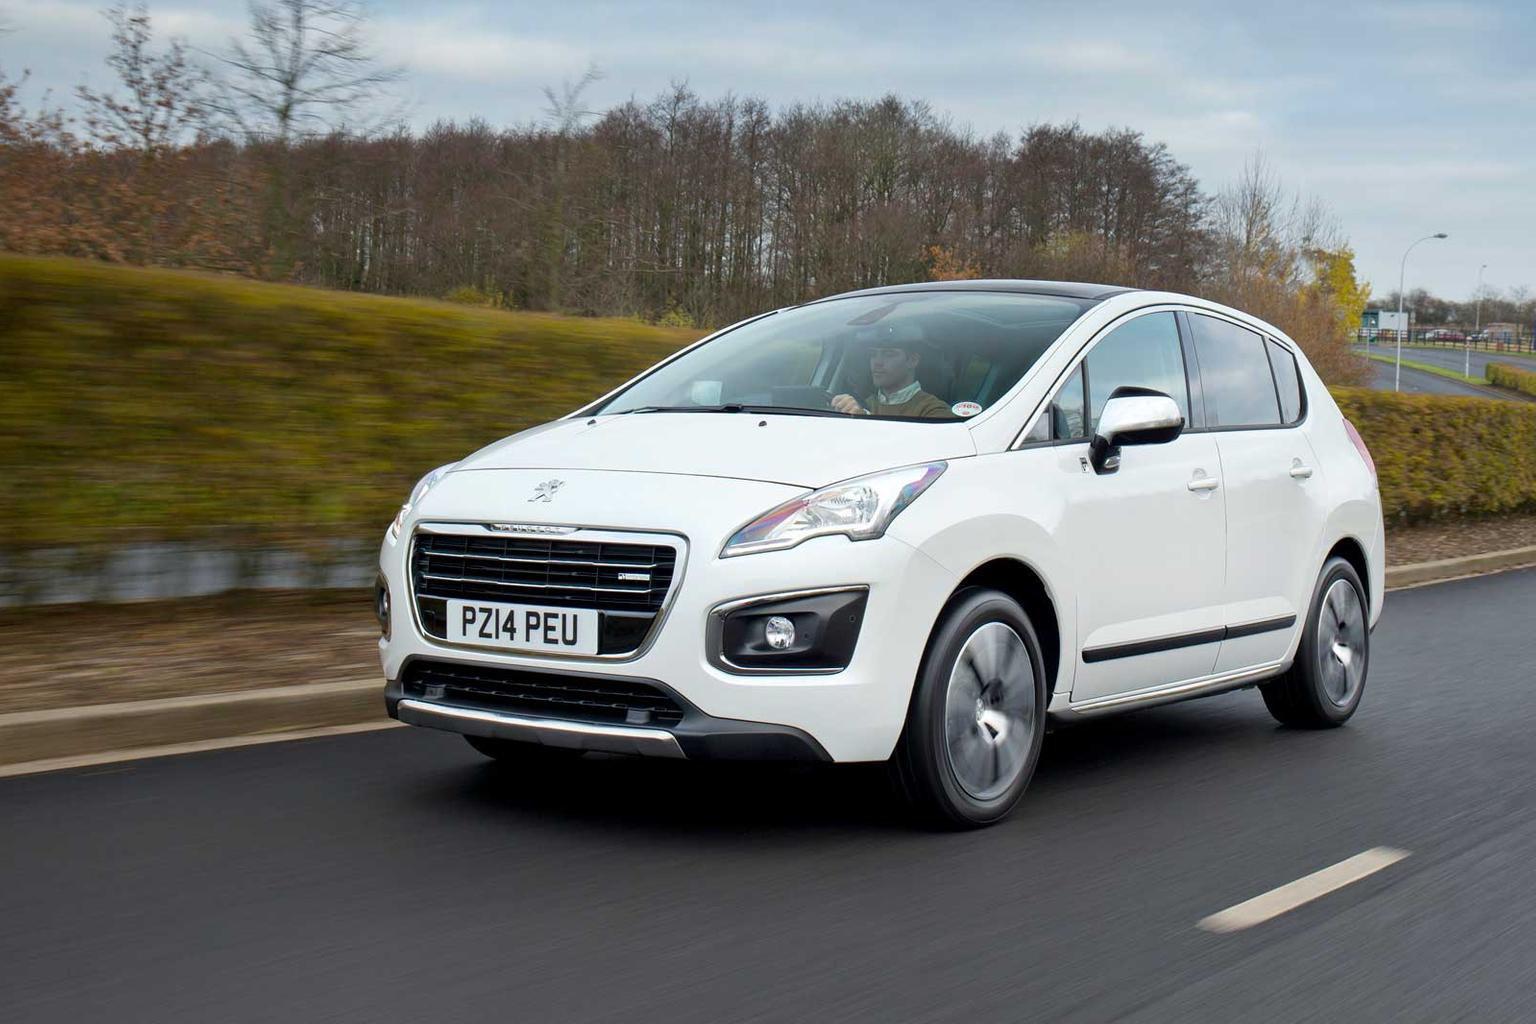 2014 Peugeot 3008 review